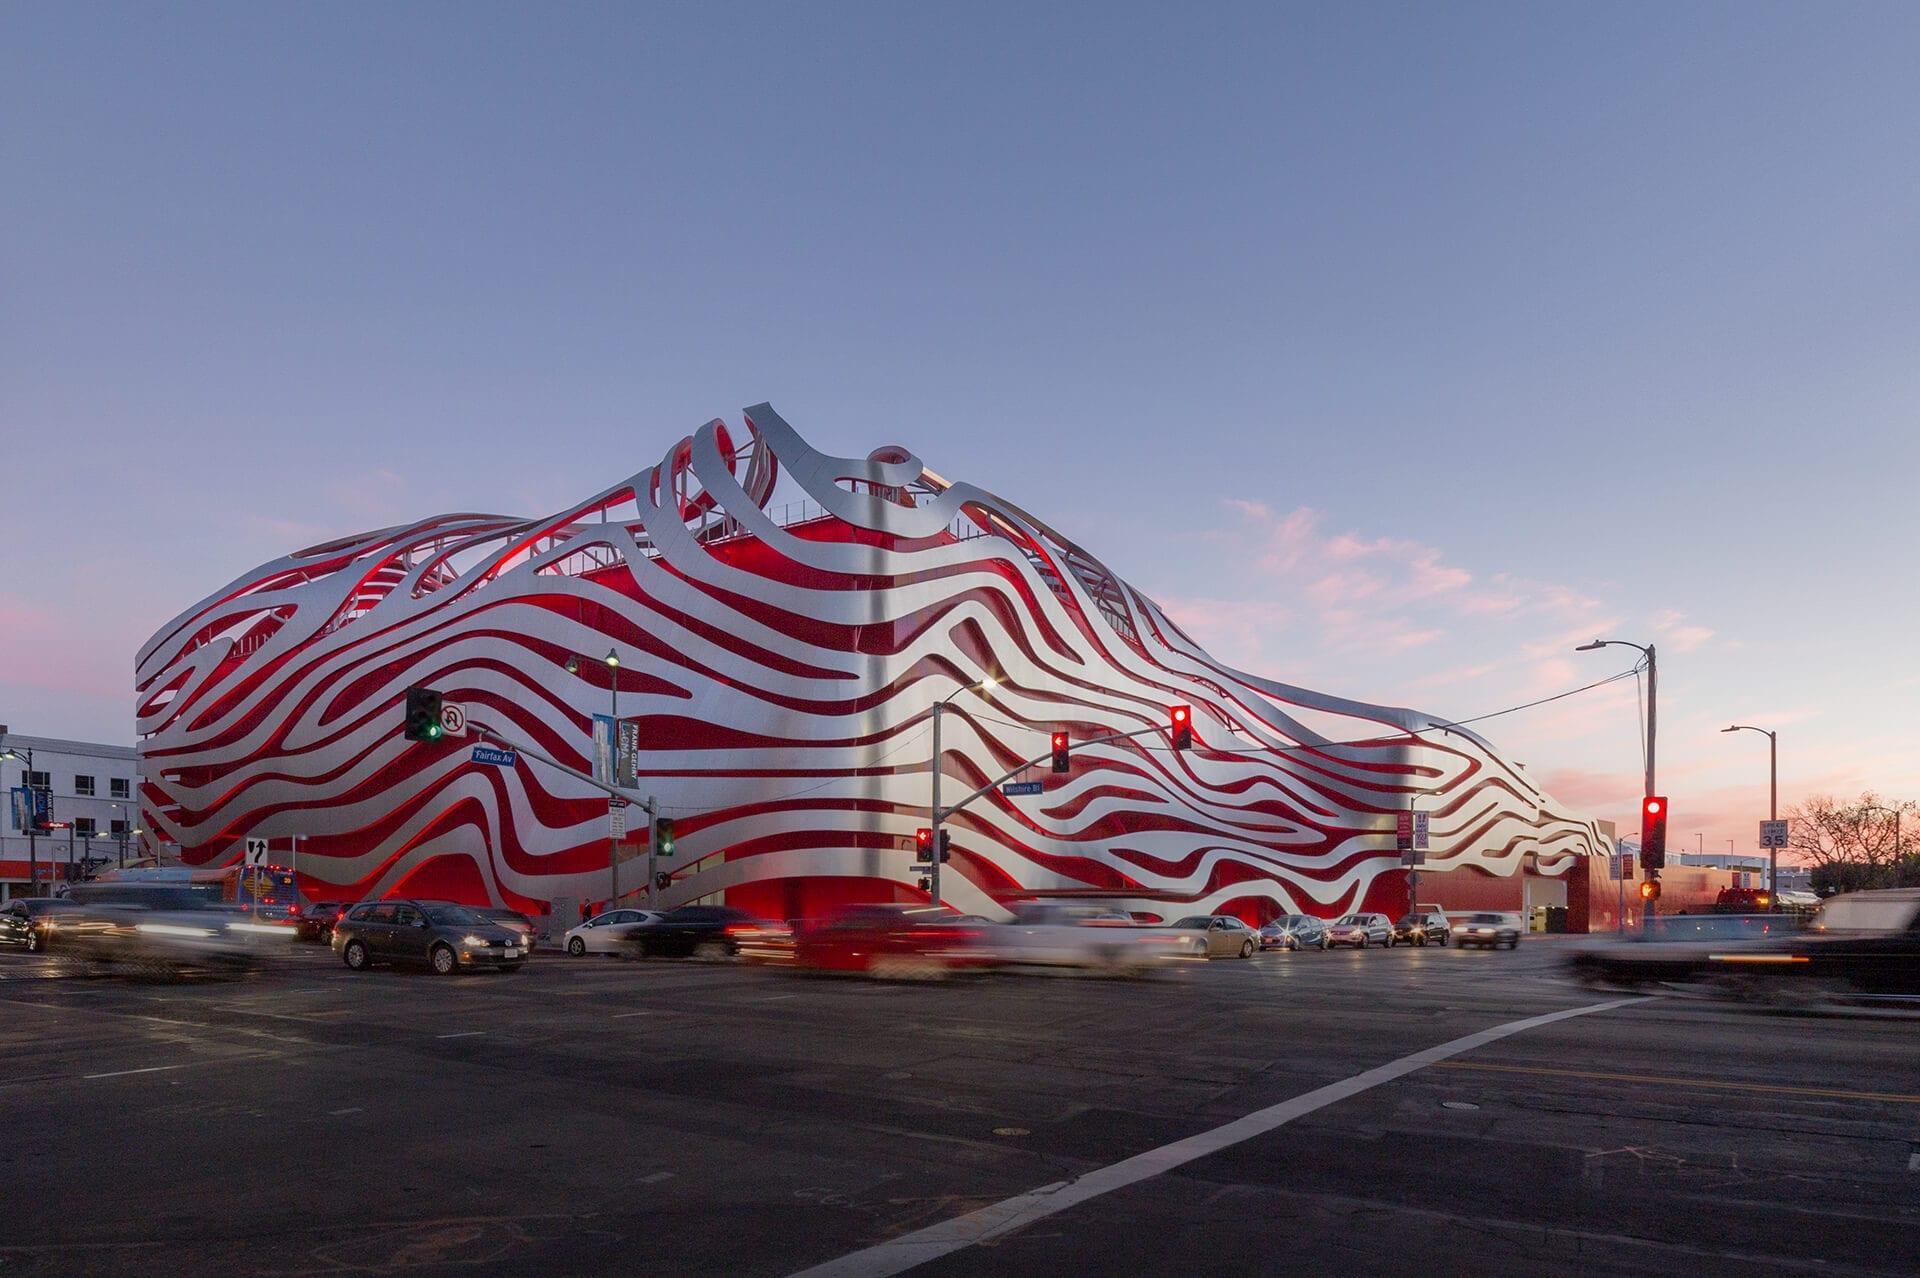 Petersen Automotive Museum in Los Angeles, California.